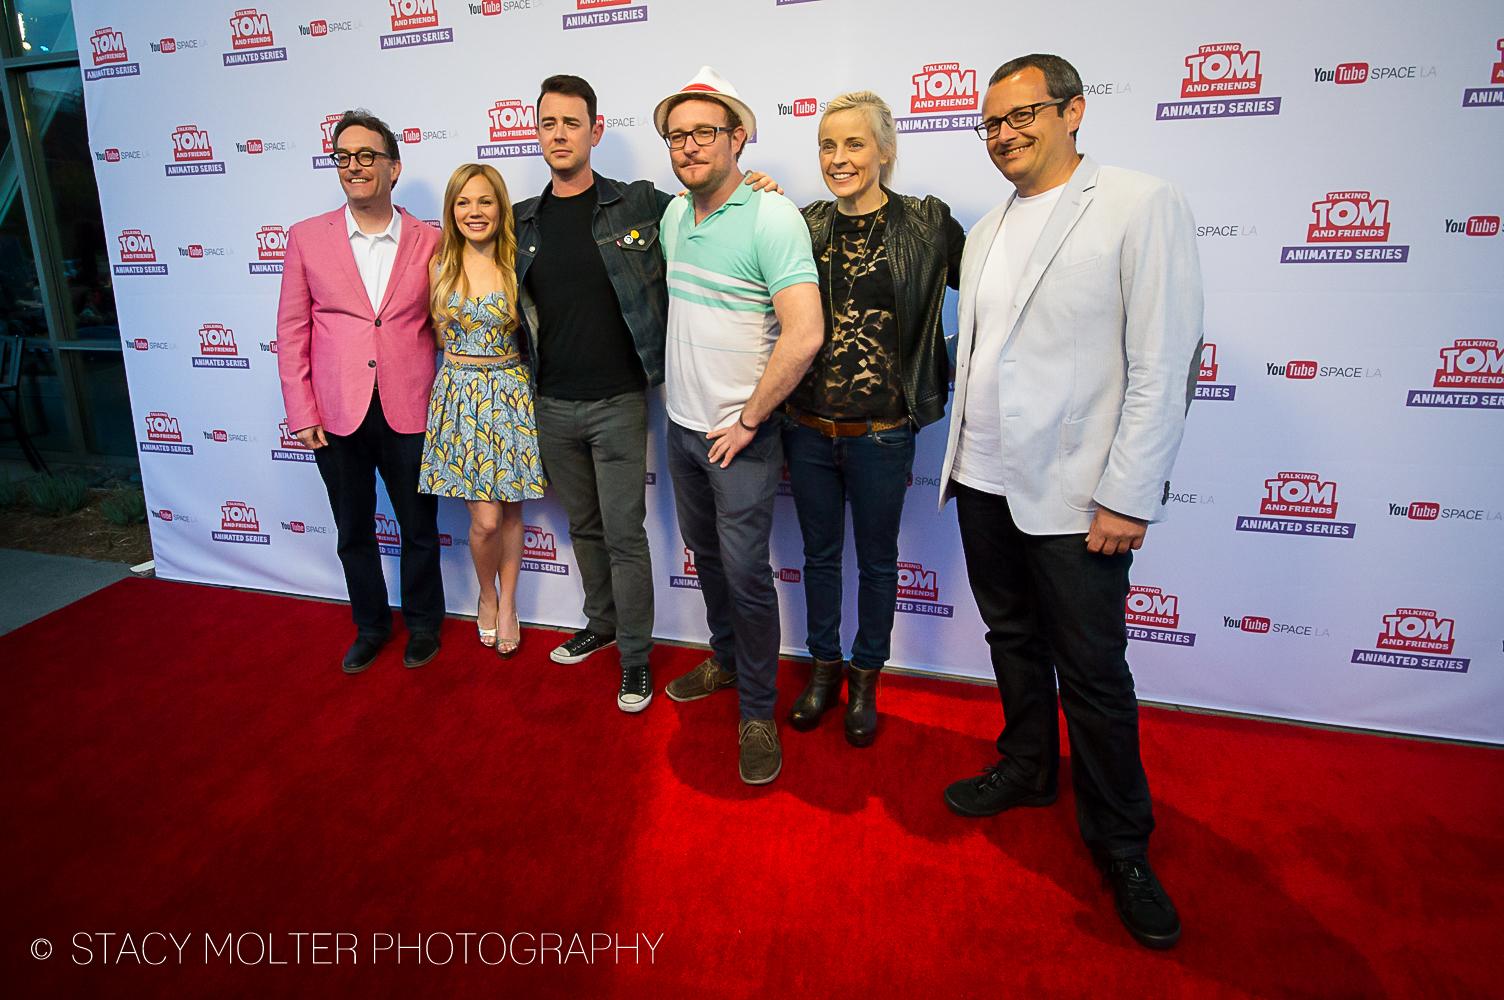 Talking Tom & Friends Red Carpet Premiere